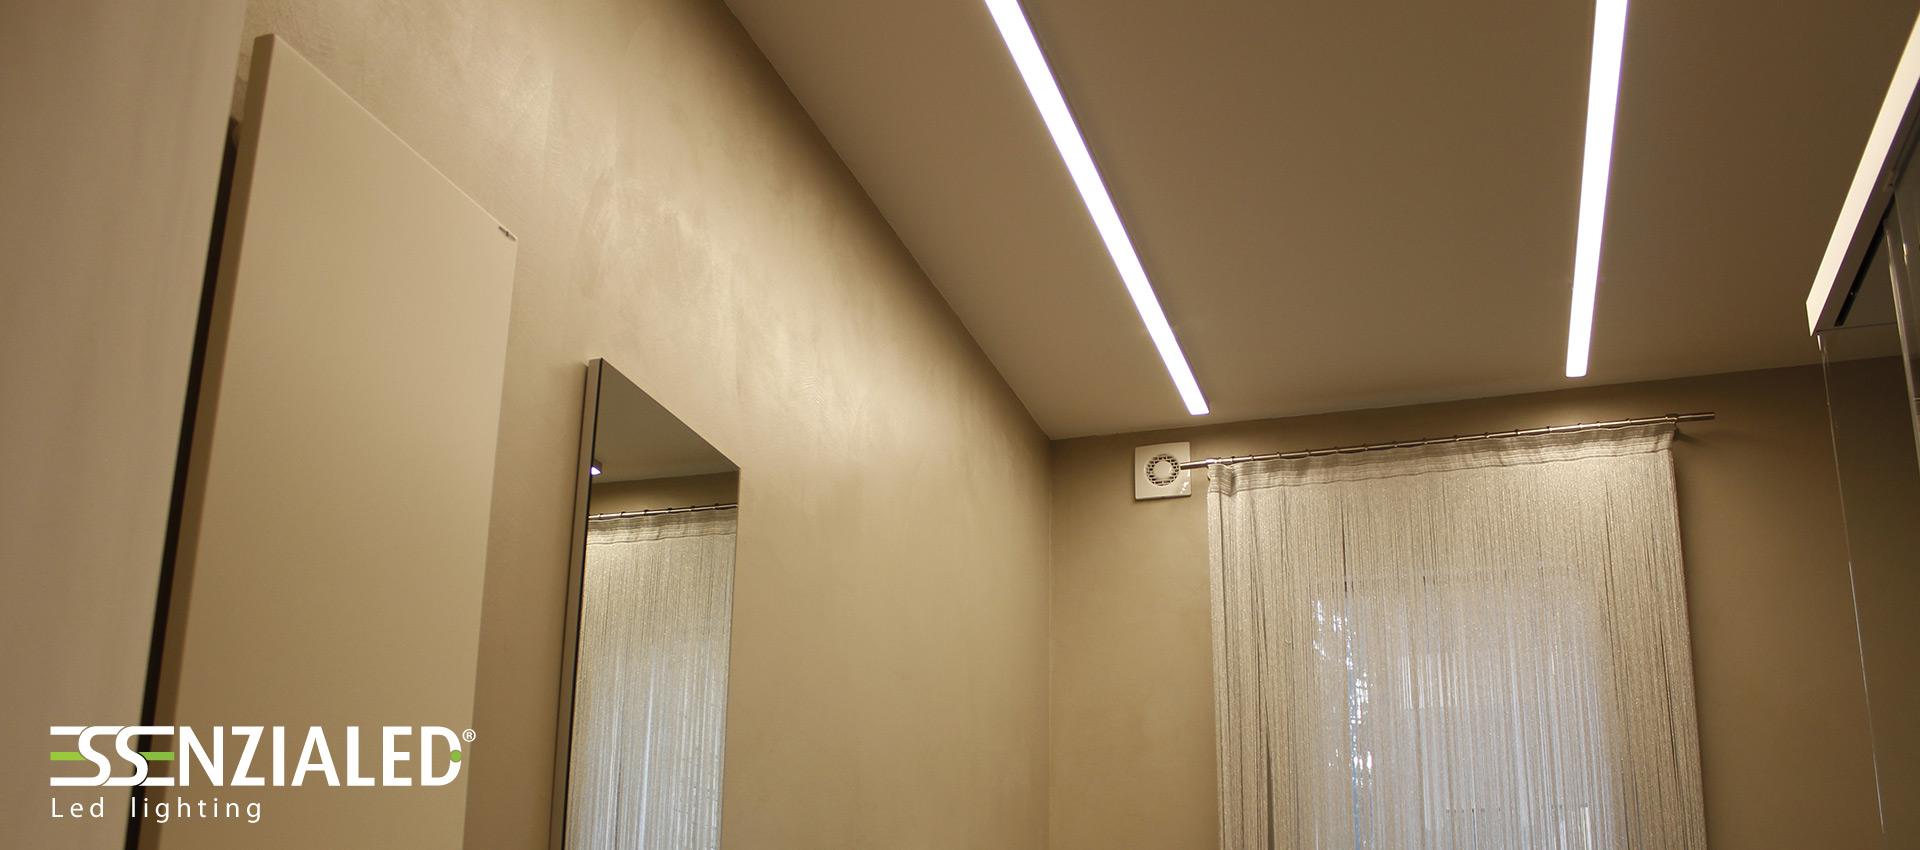 Big lampada lineare led essenzialed su for Illuminazione led a soffitto